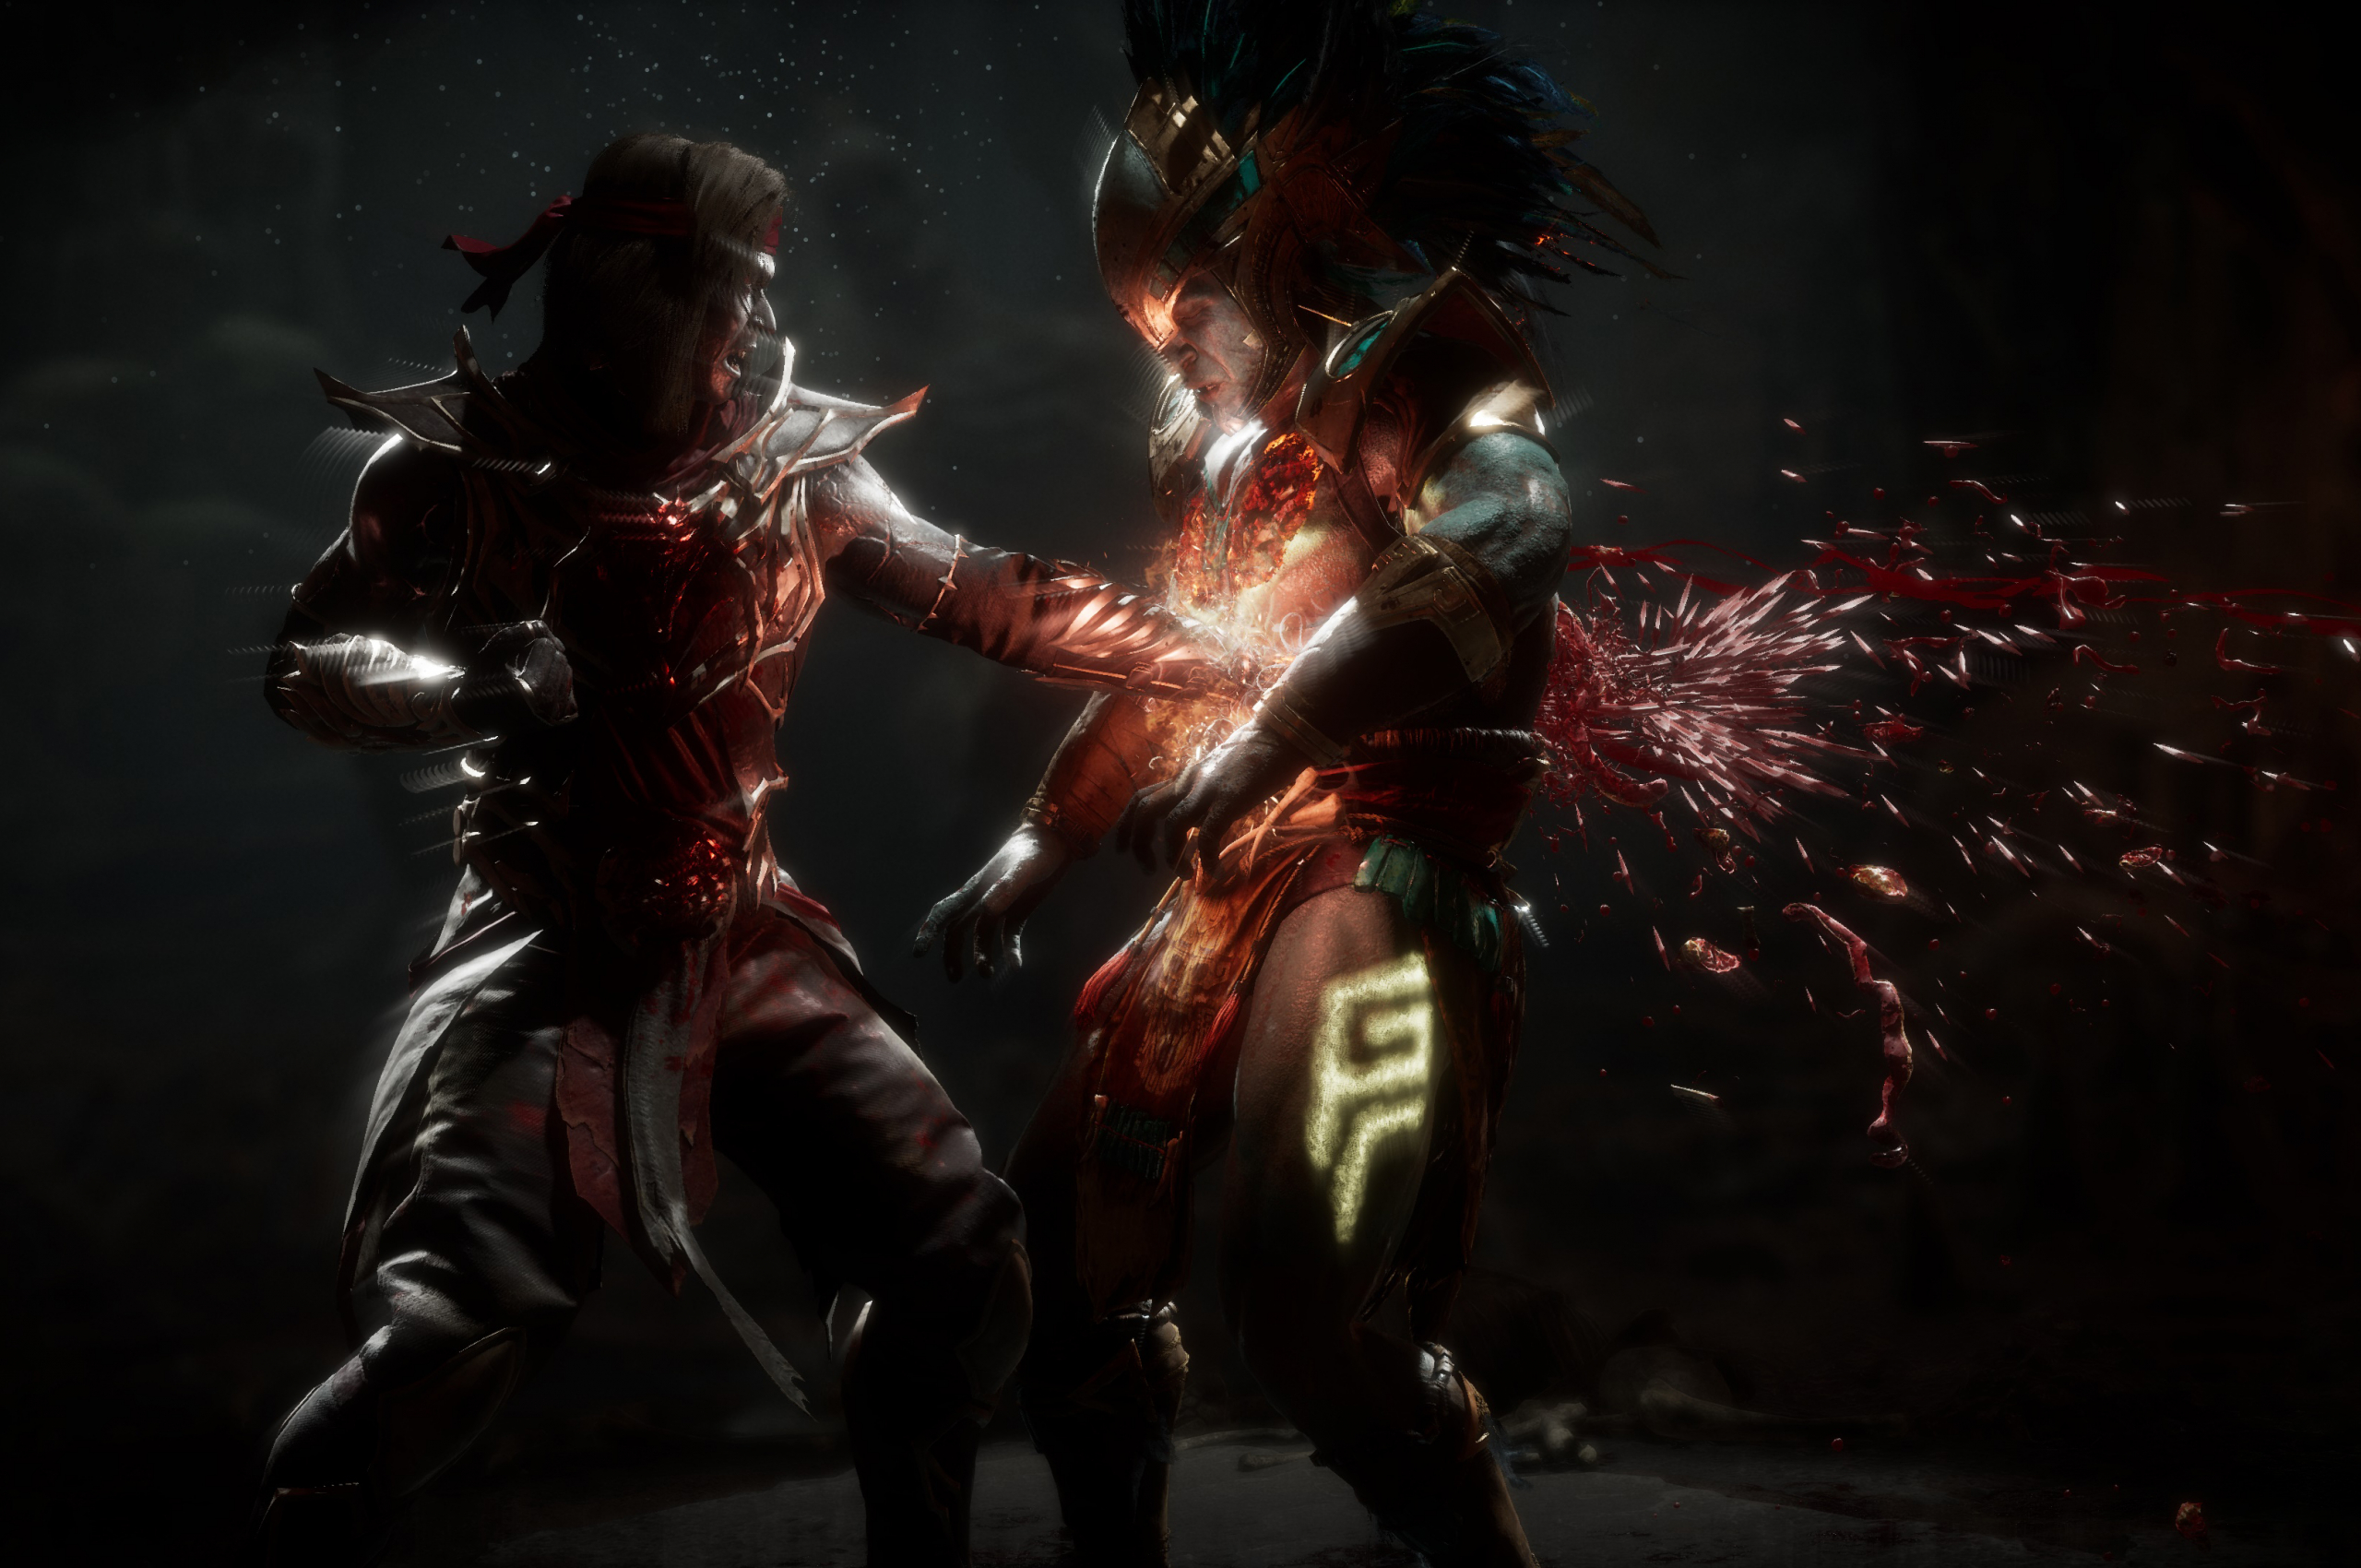 Free Download Mortal Kombat 11 Gameplay Wallpaper Hd Games 4k